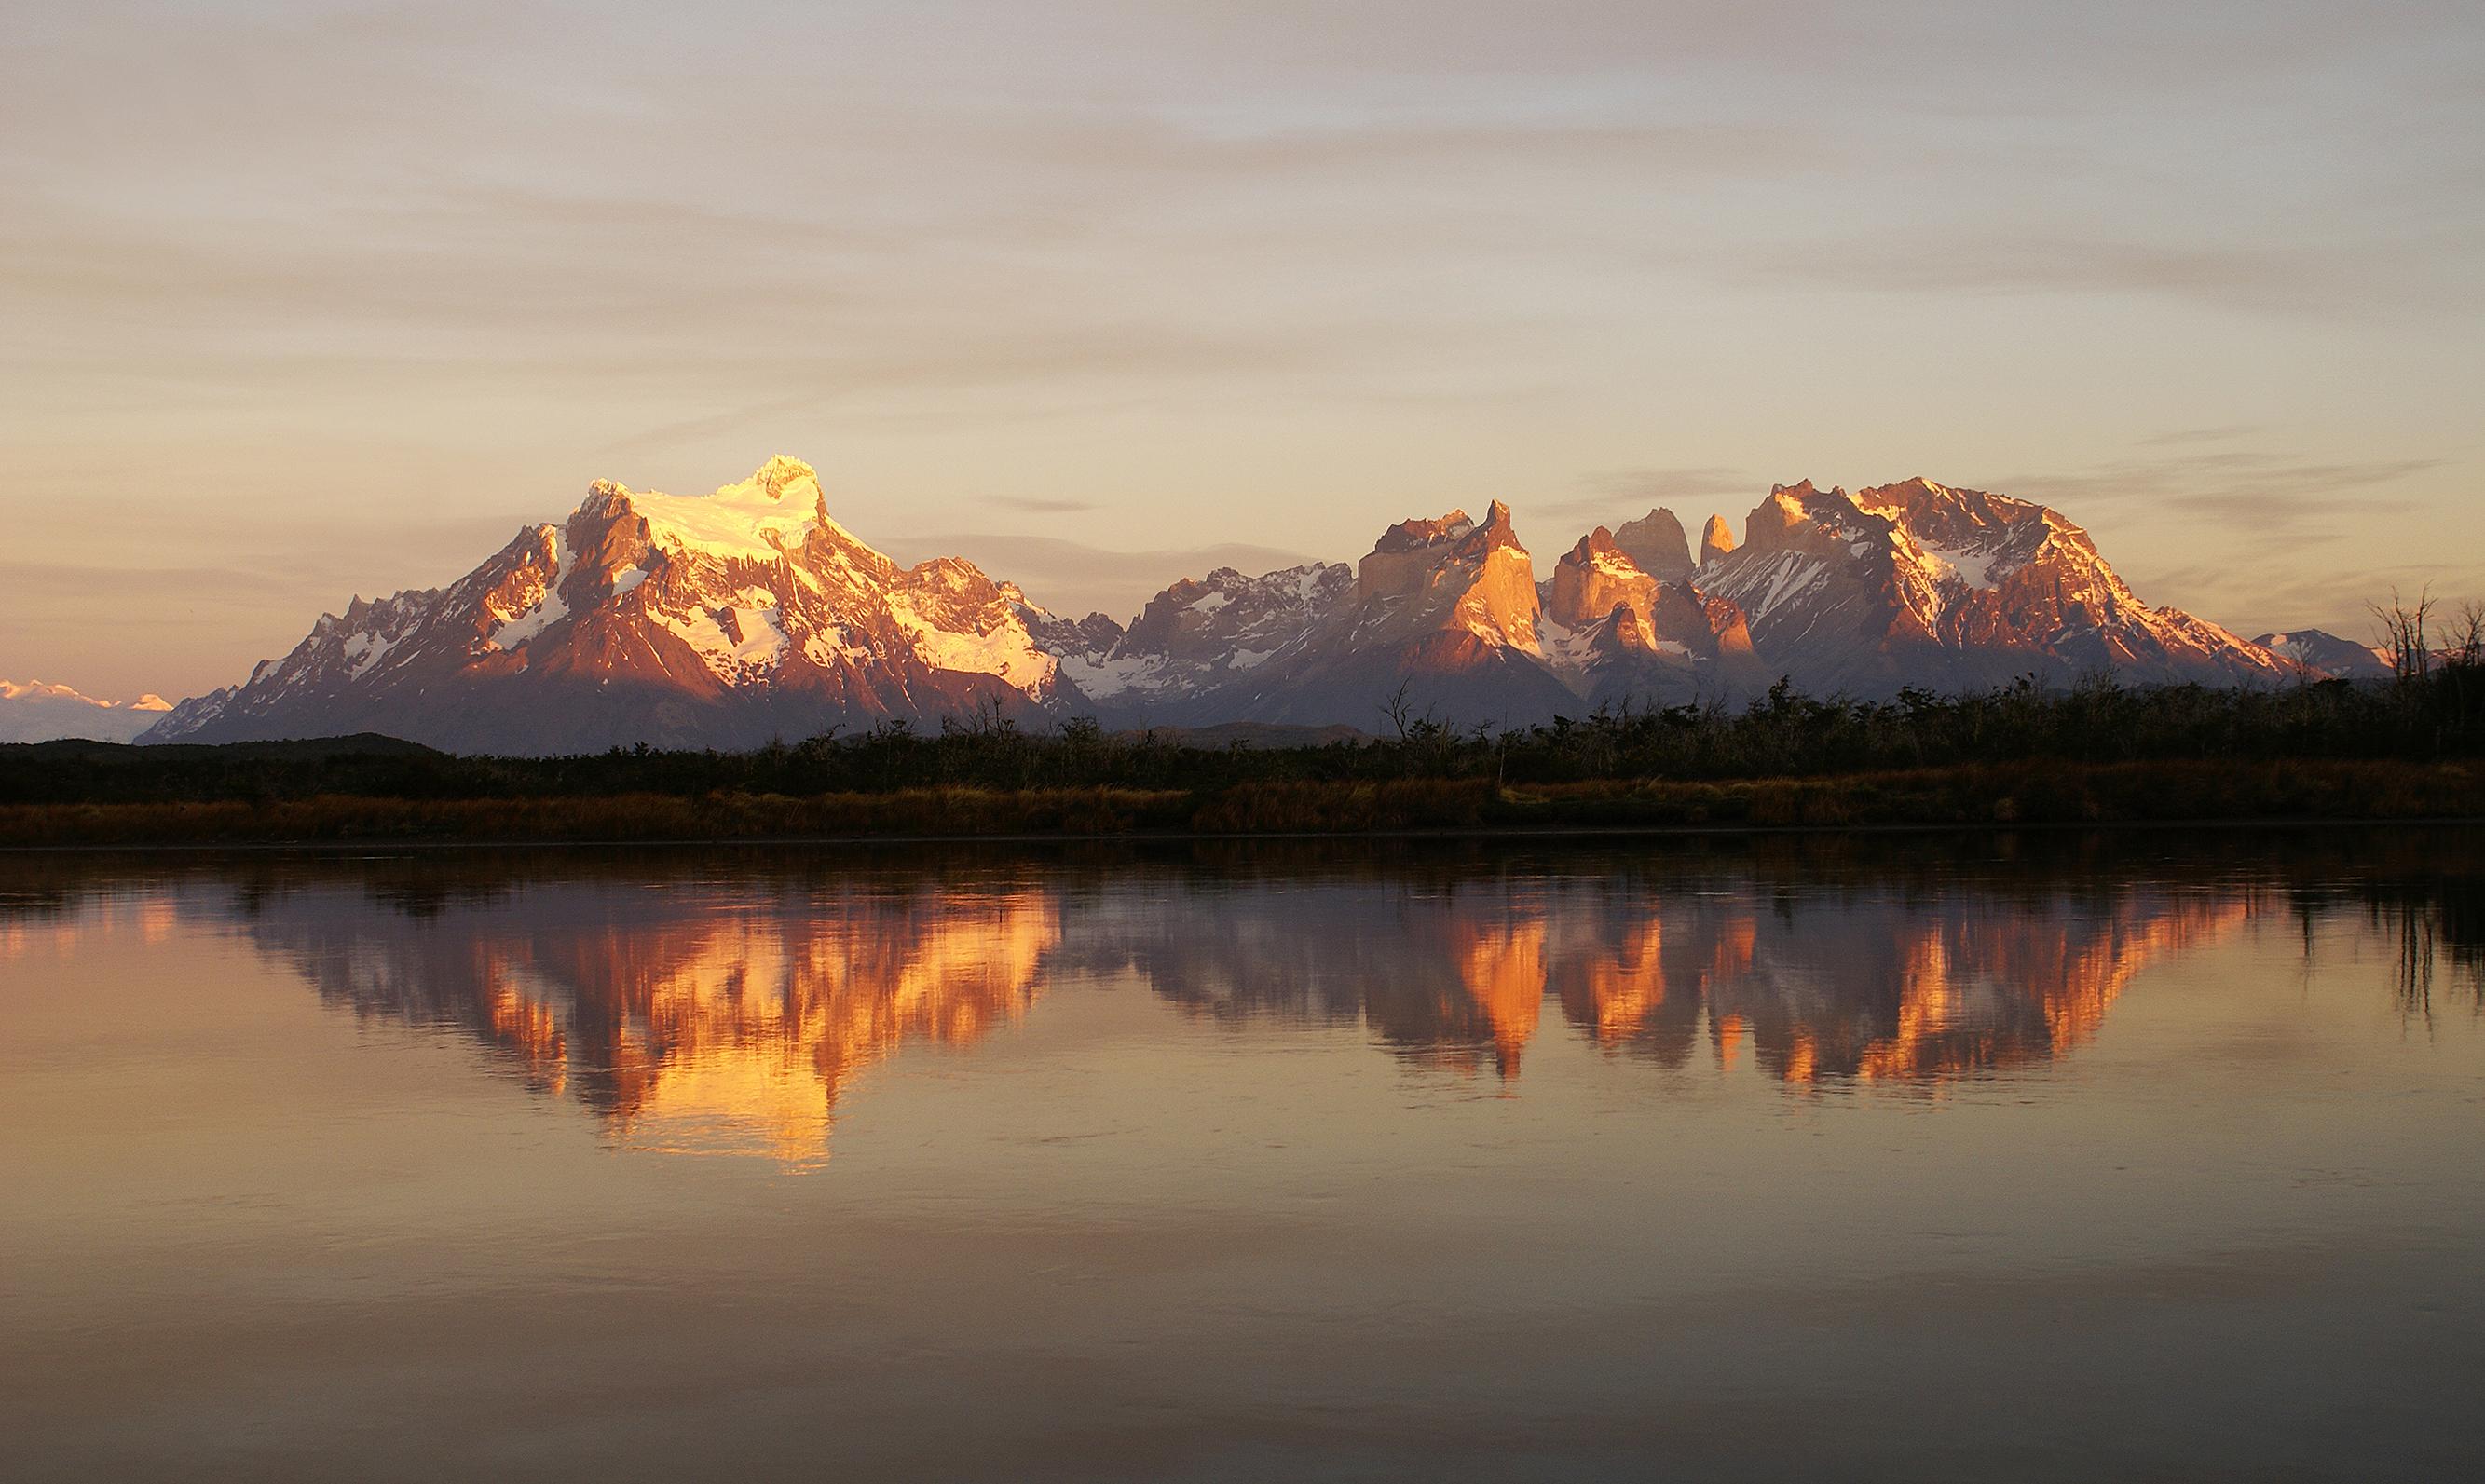 Santiago, Laguna San Rafael e Torres del Paine